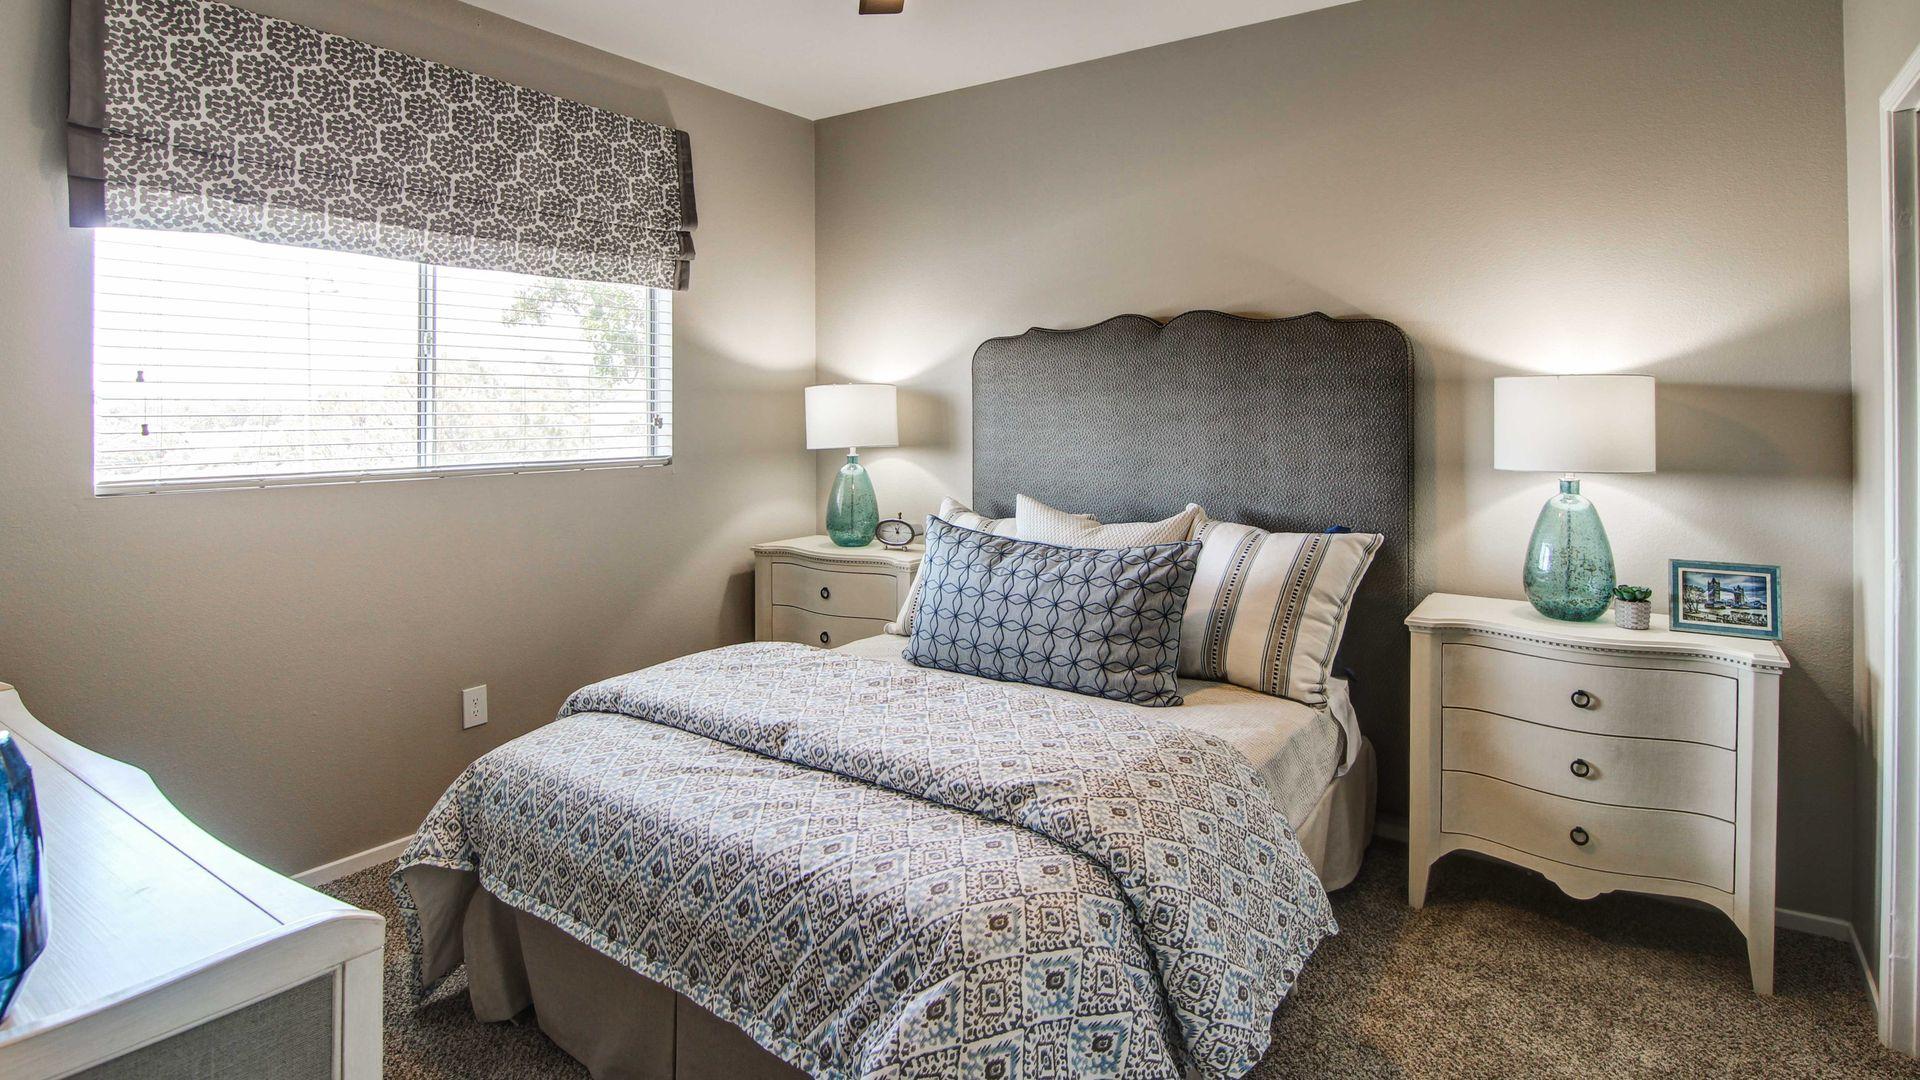 2 bed apartment at Madrid Apartments, 28401 Los Alisos ...